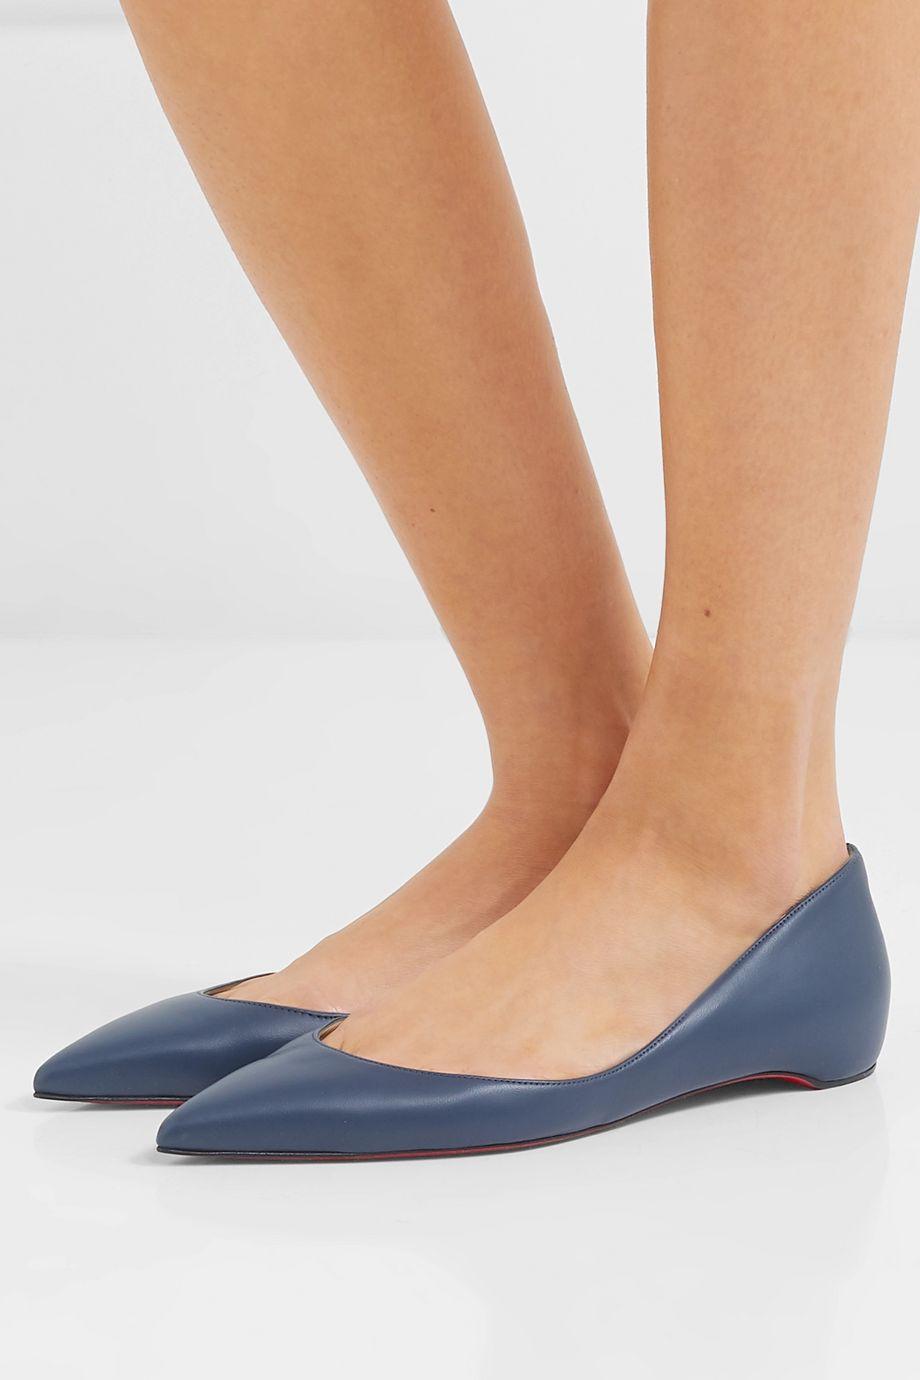 Christian Louboutin Iriza leather point-toe flats